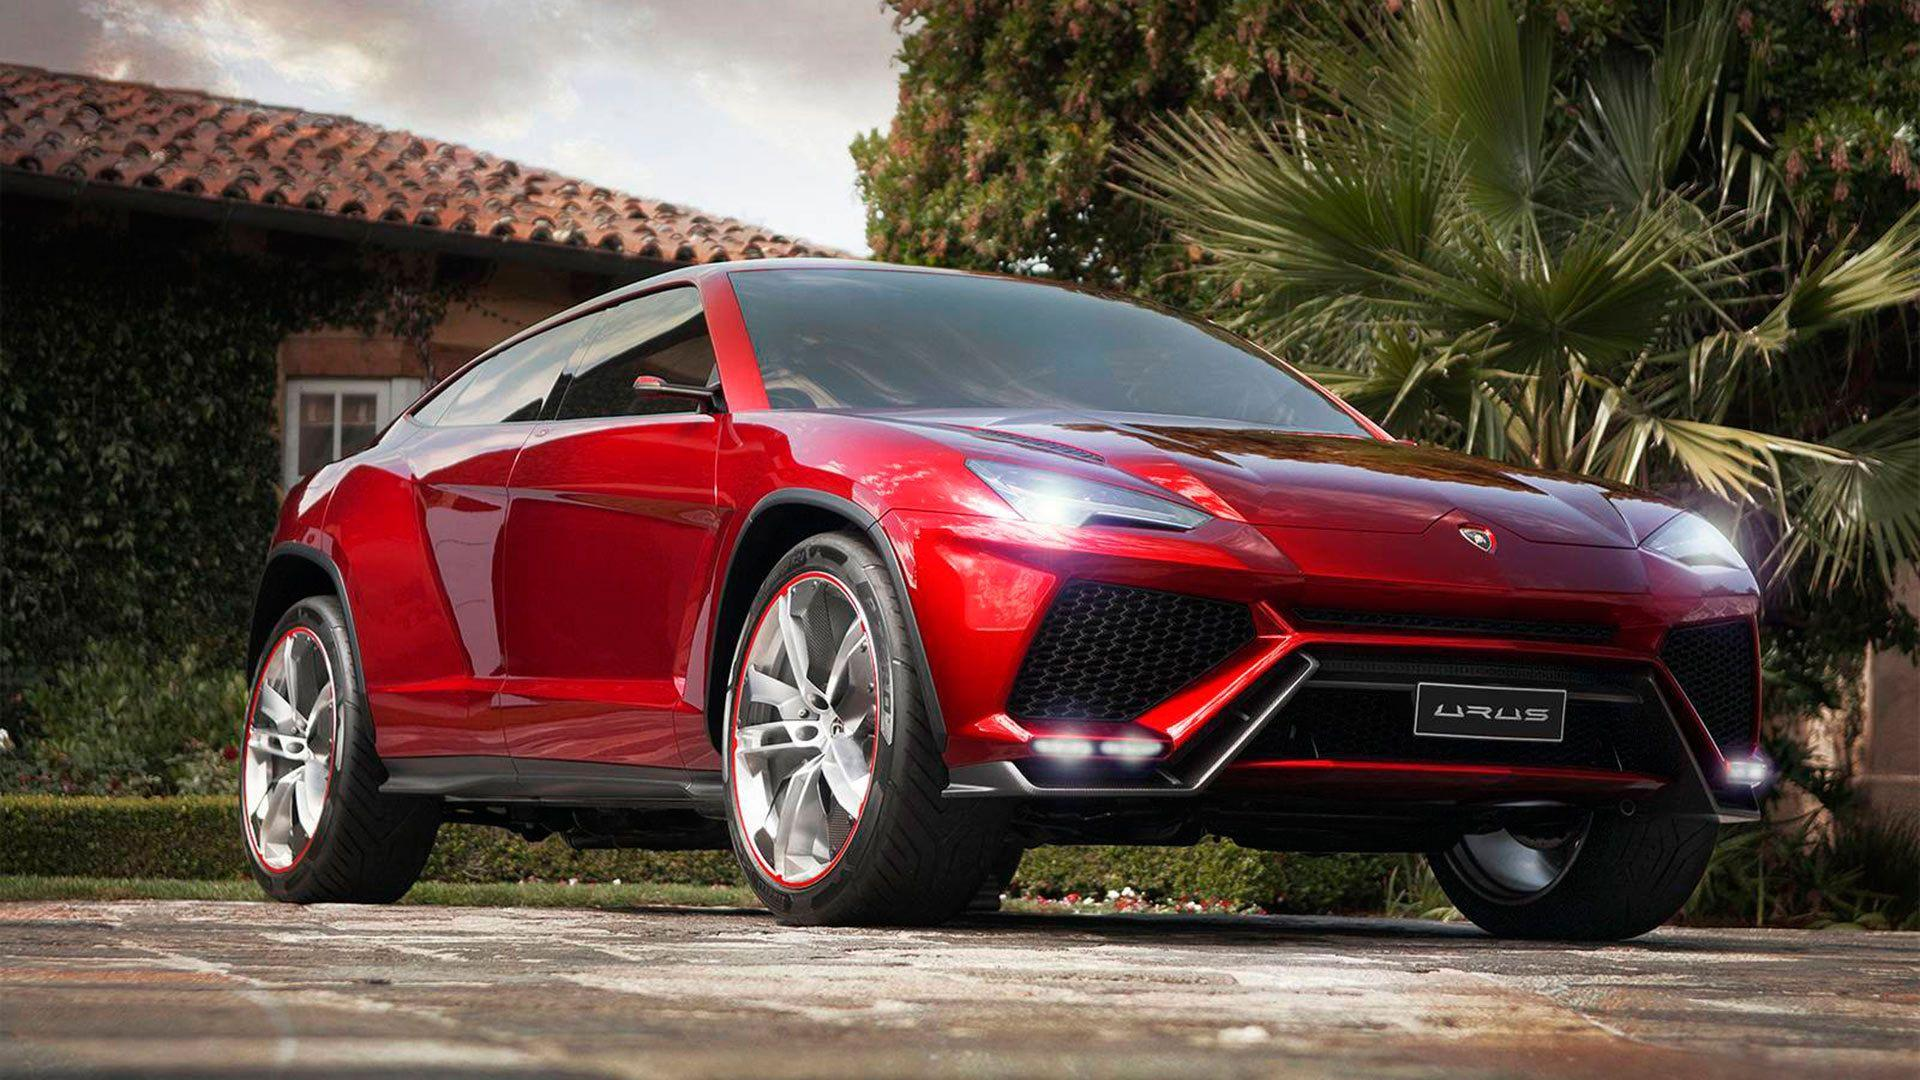 Lamborghini Urus Wallpapers Wallpaper Cave